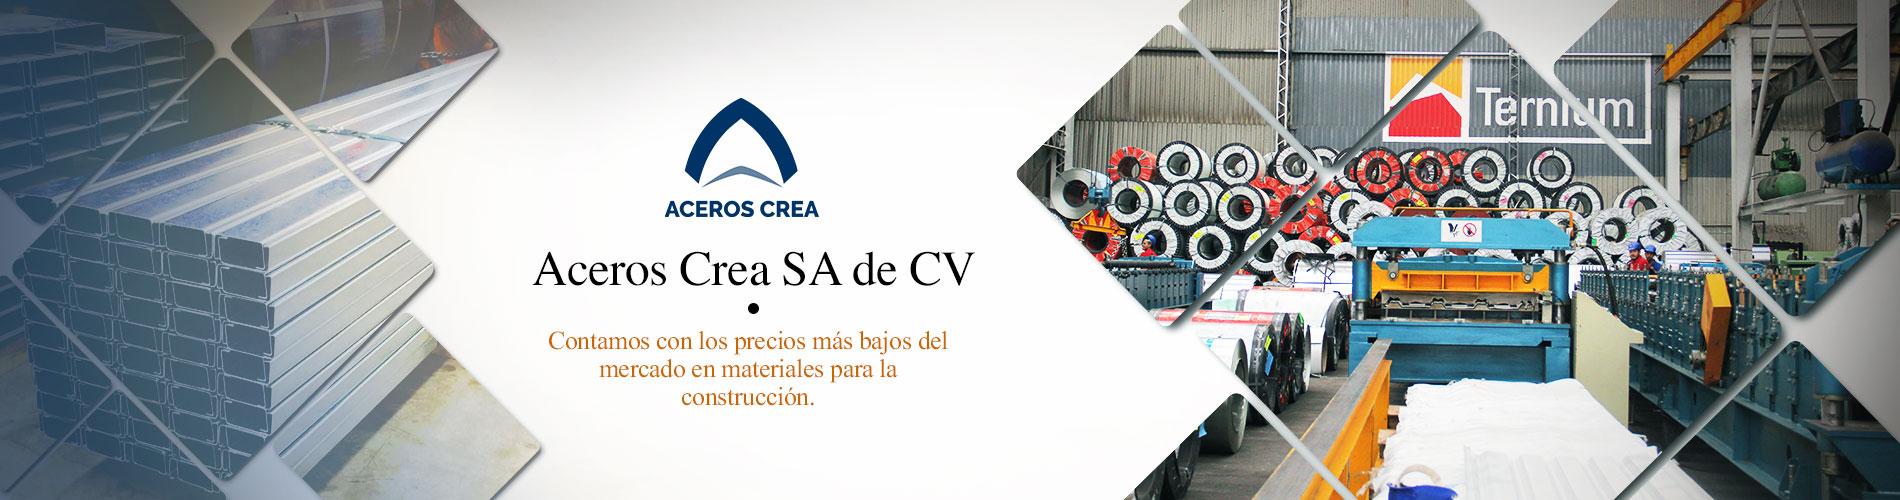 banner-aceros-crea